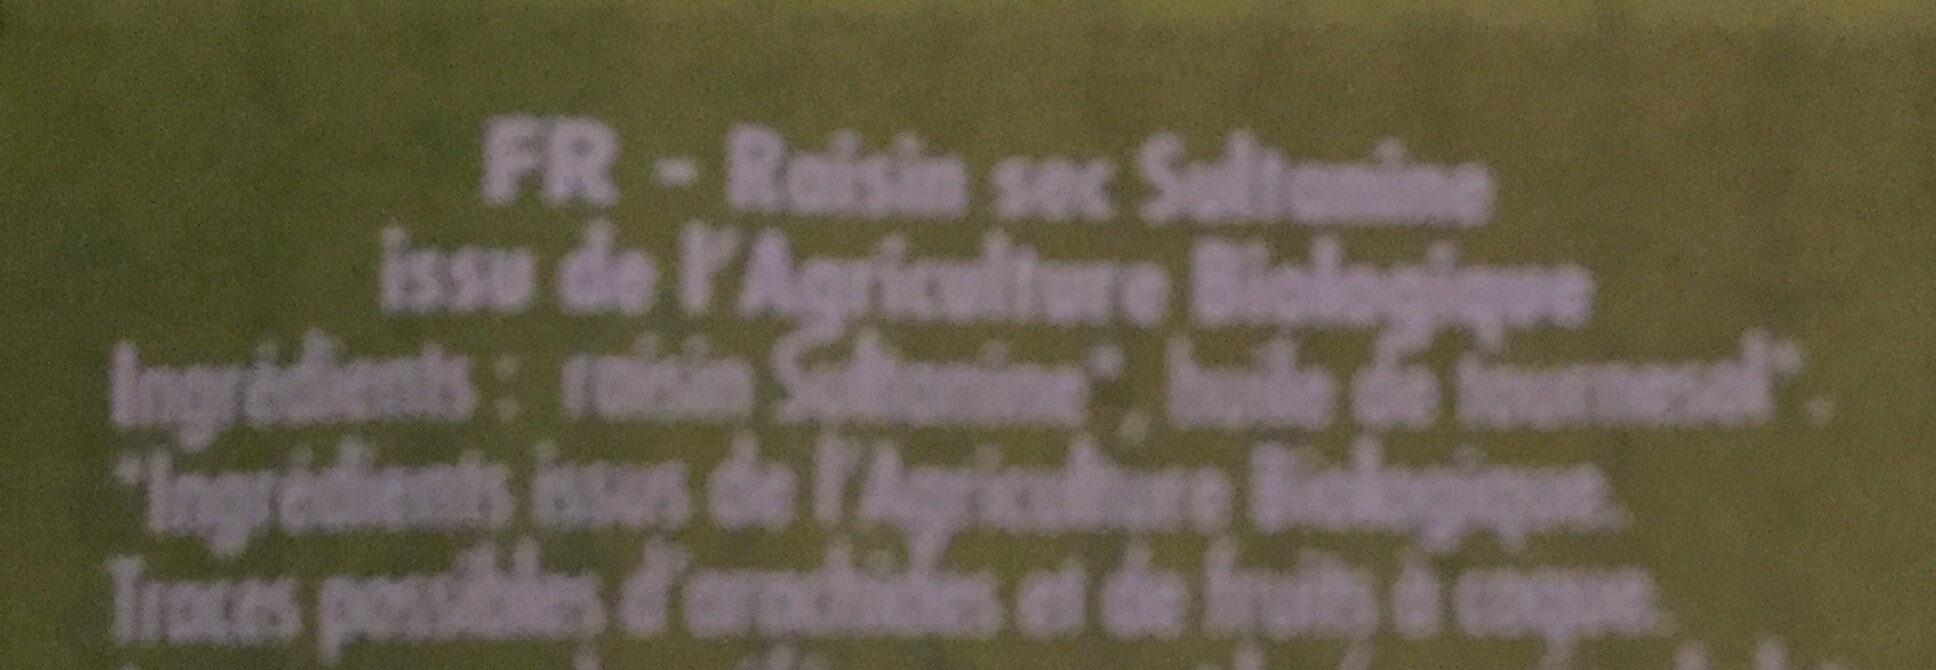 Raisin sec sultanine - Ingrédients - fr